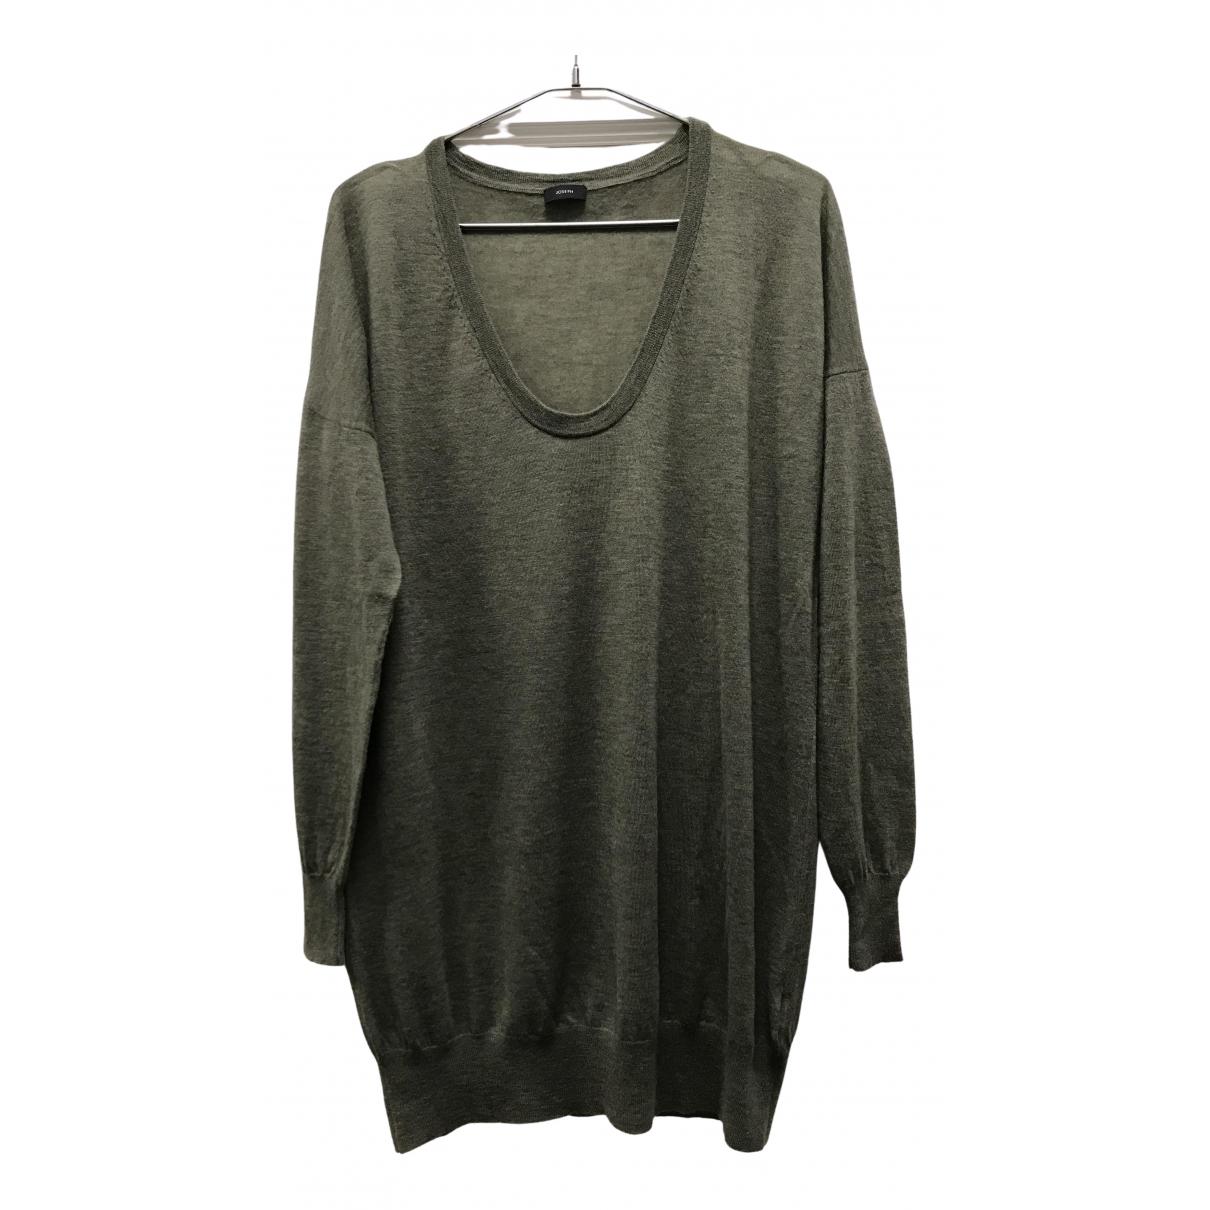 Joseph \N Khaki Cashmere Knitwear for Women L International